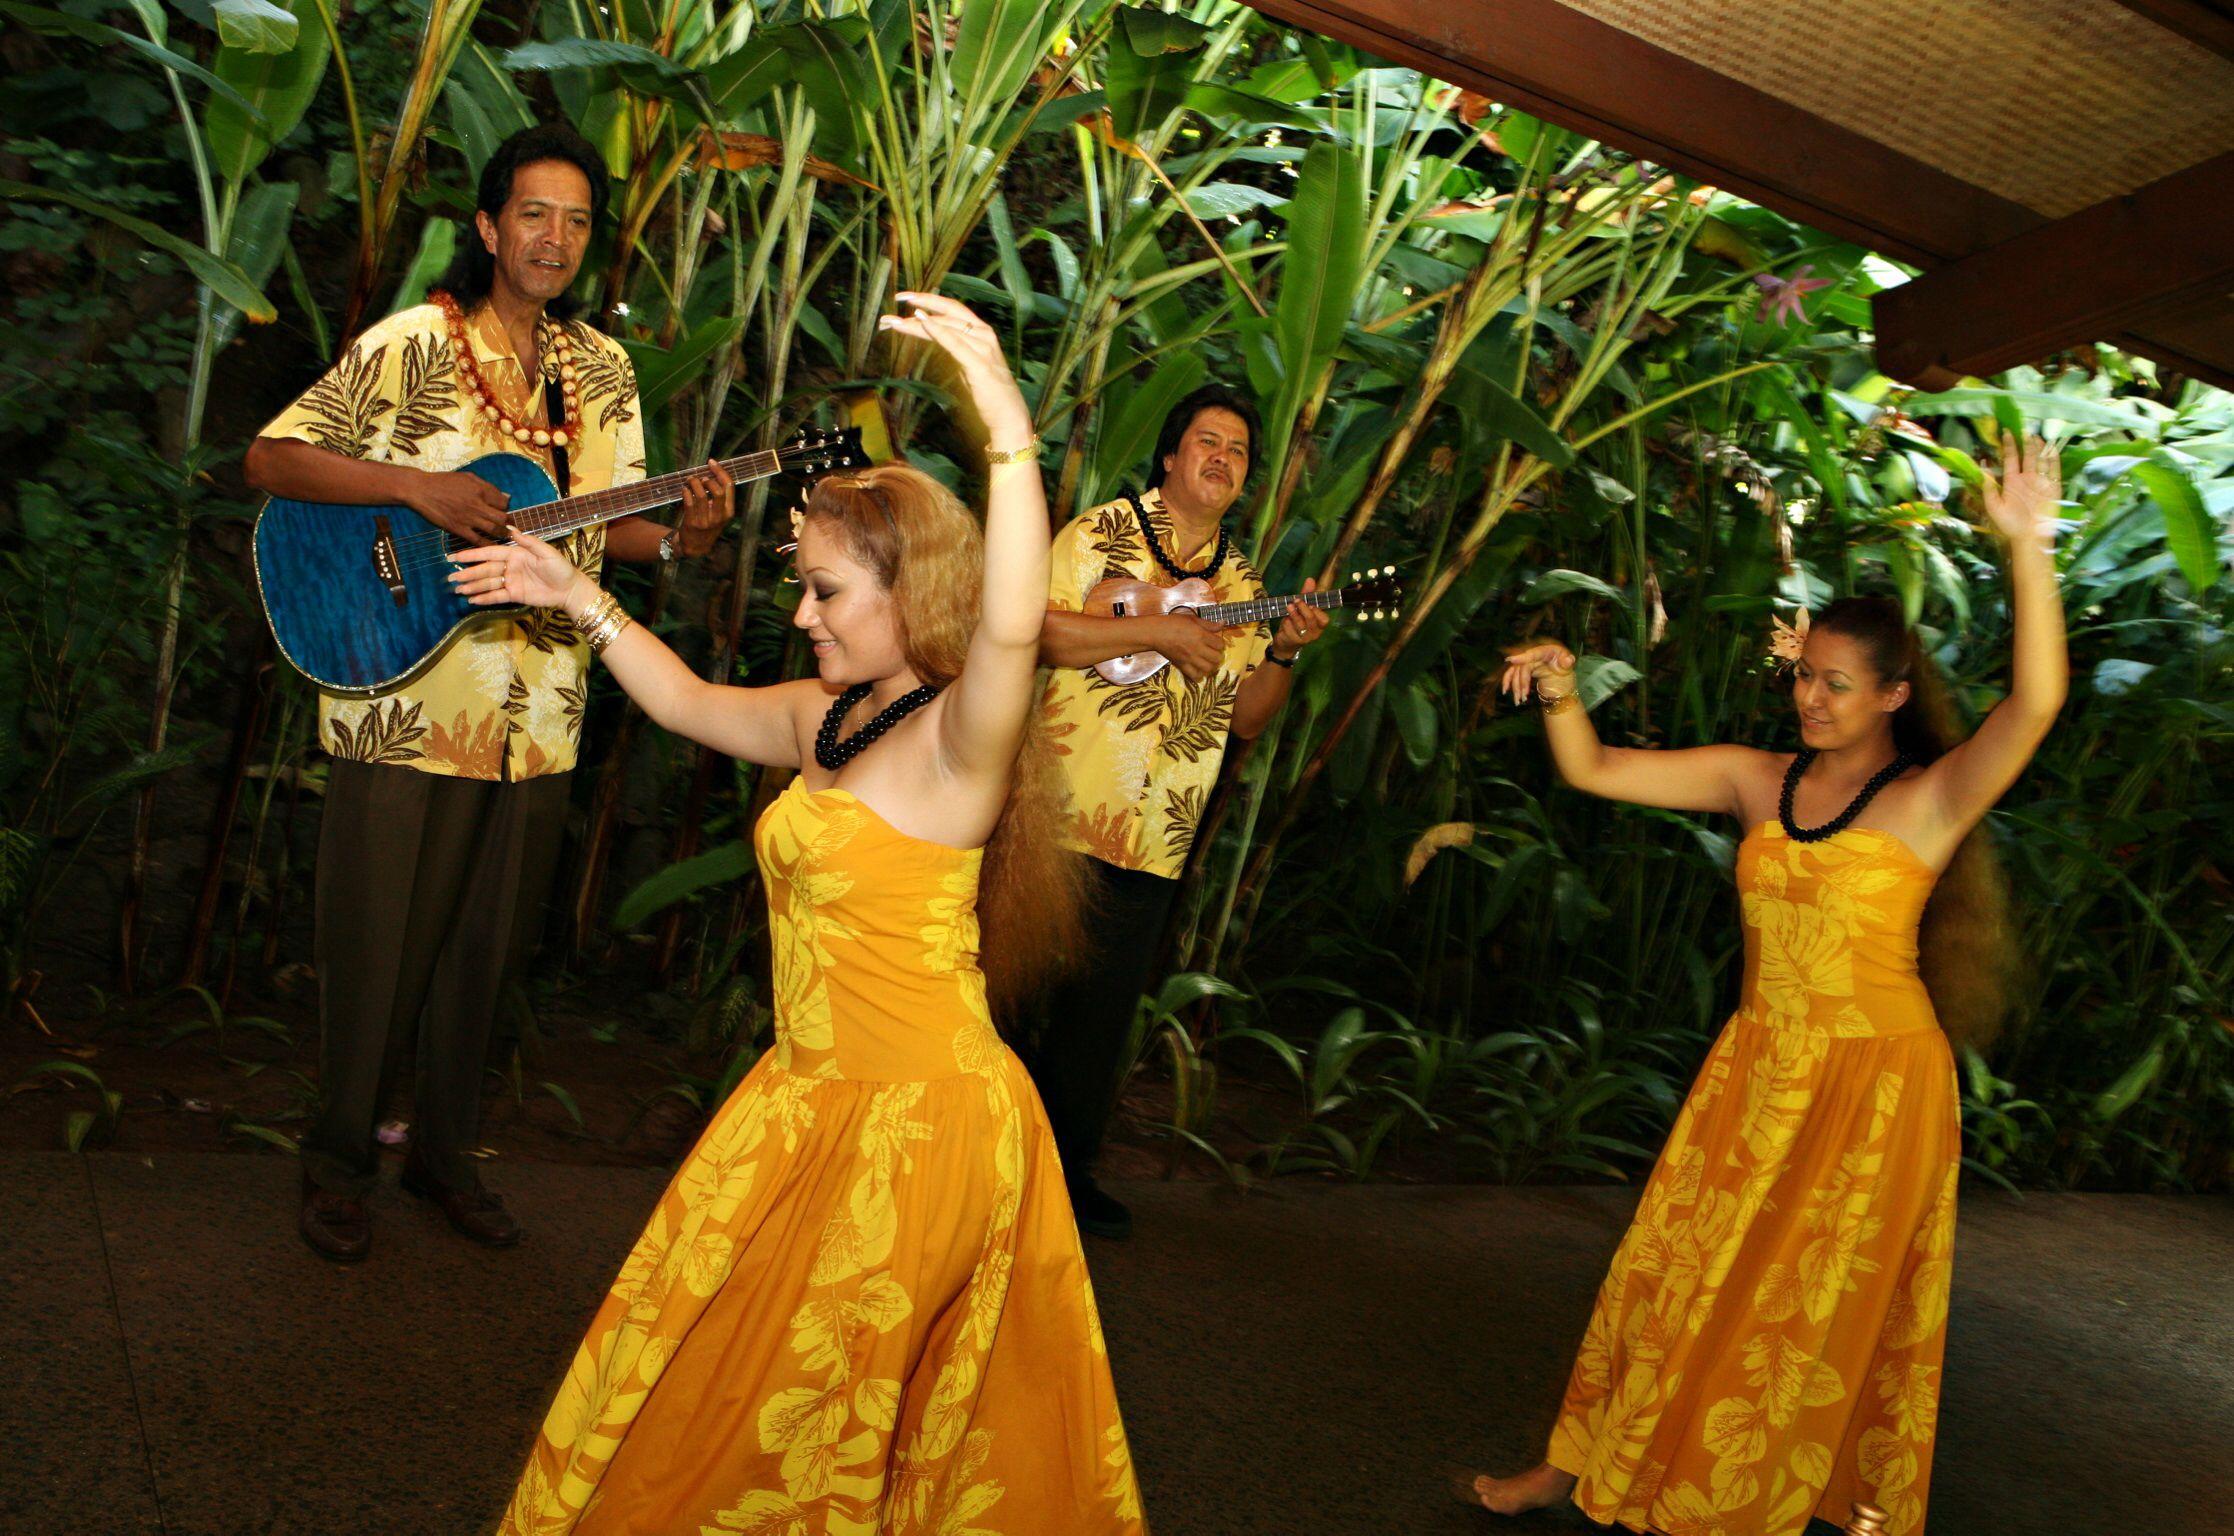 Hula dancers Garden weddings ceremony, Hula dancers